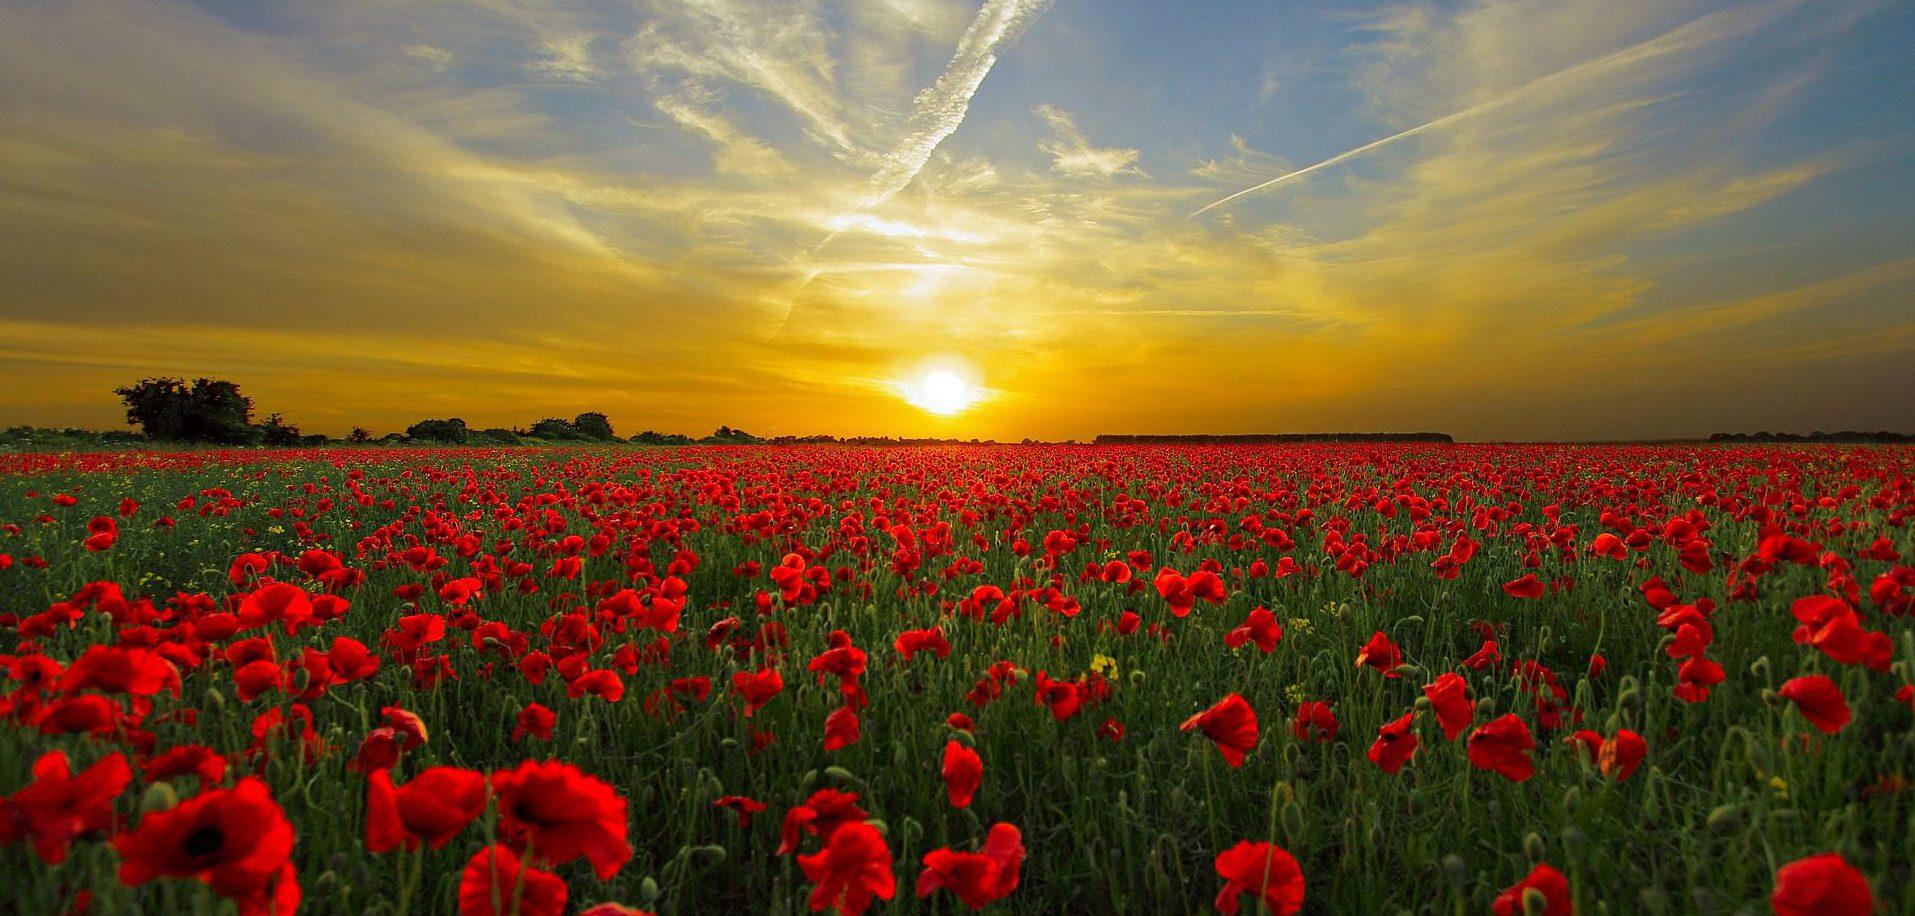 Sunrise over flowers